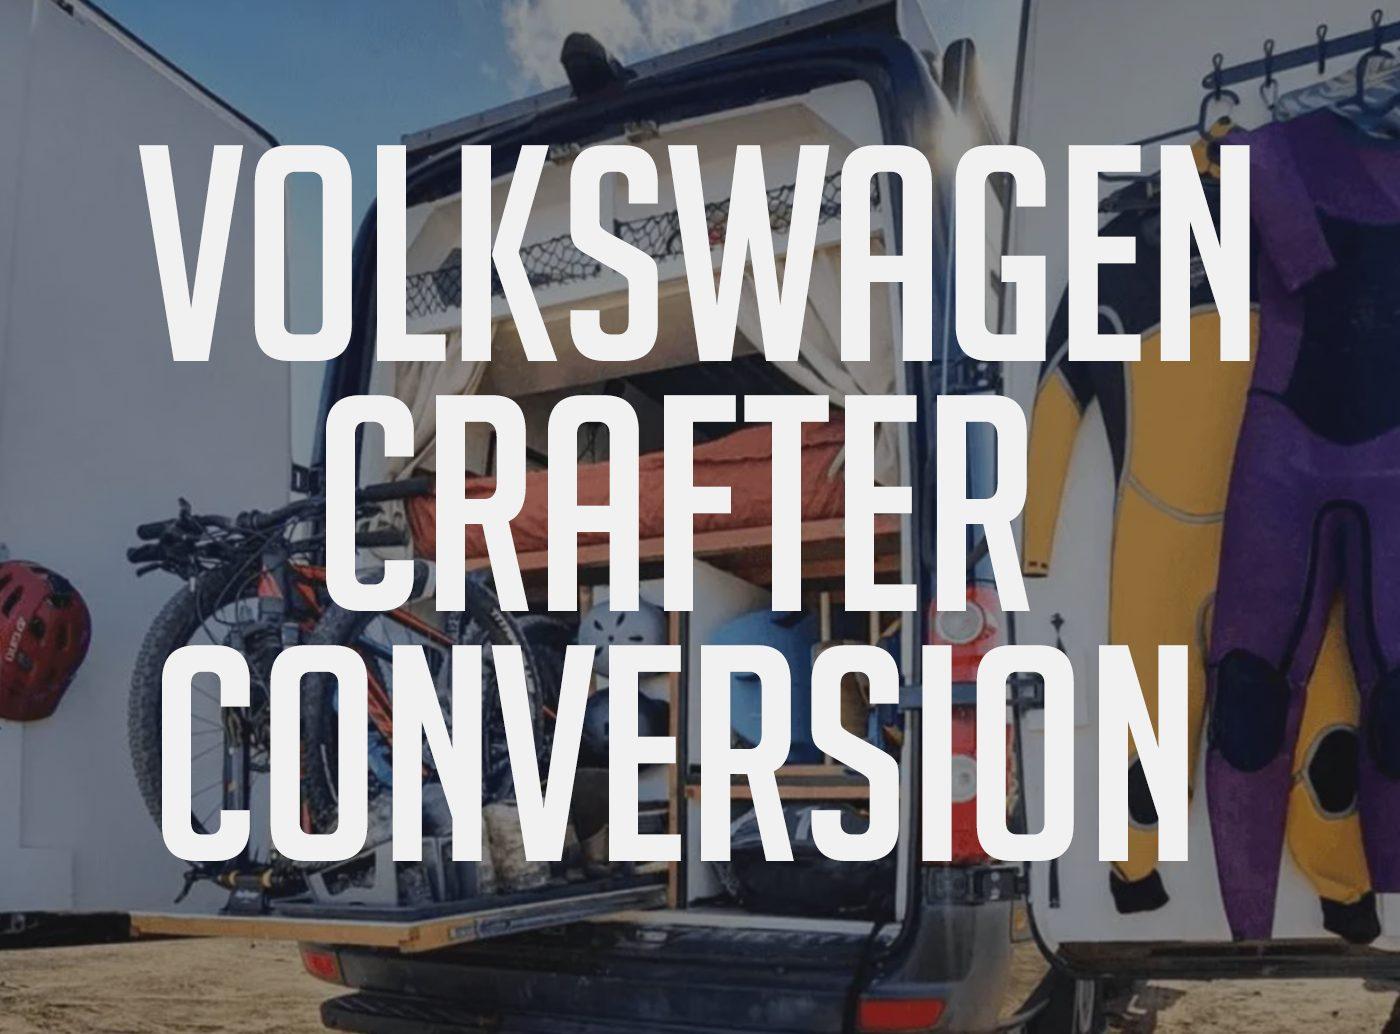 Volkswagen Crafter Conversion ombouwen